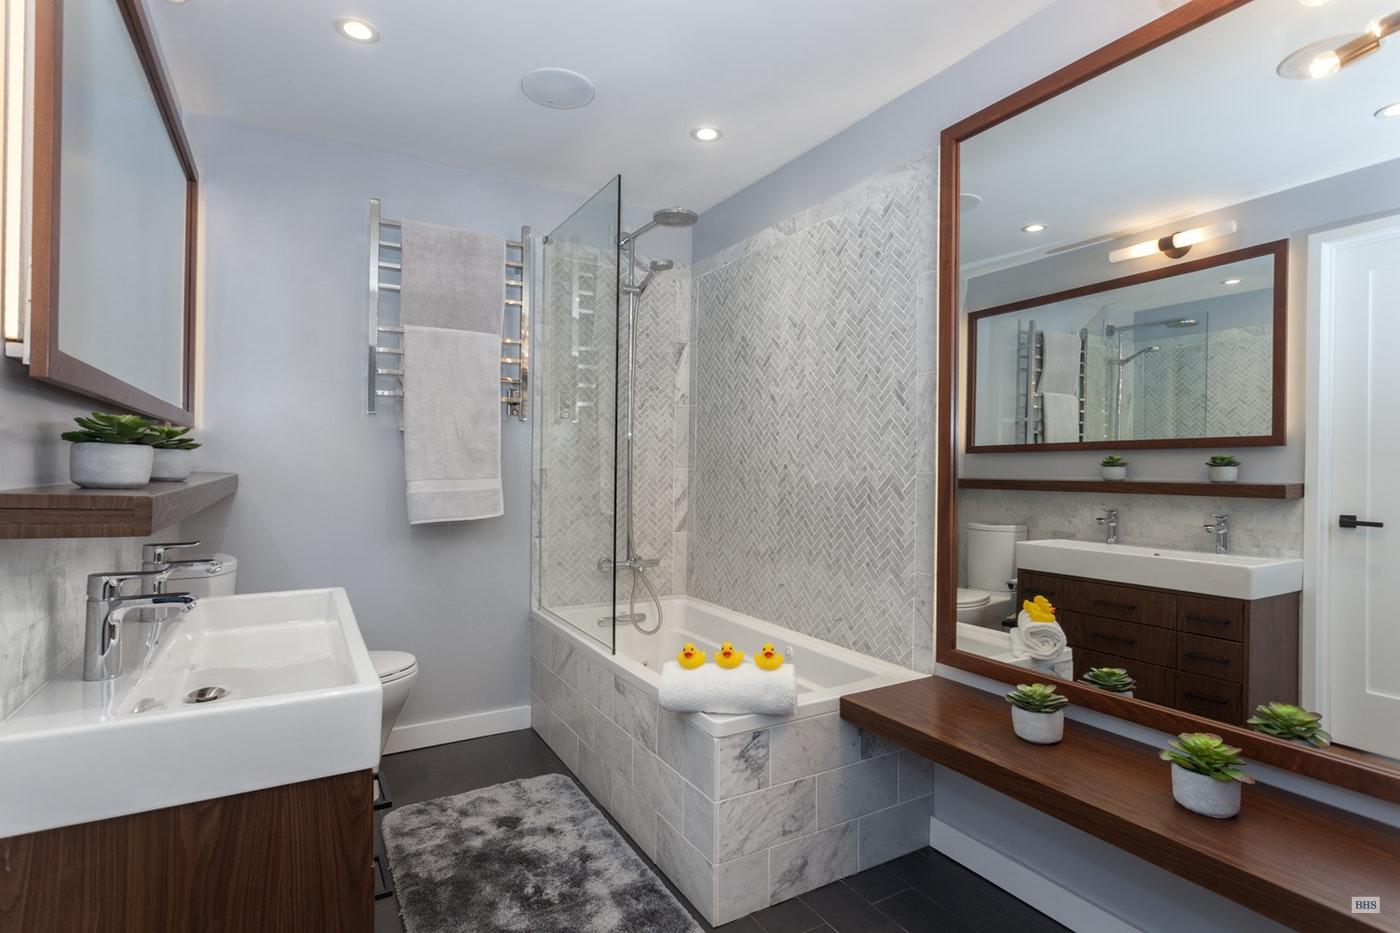 16486854-6-Bathroom.jpg